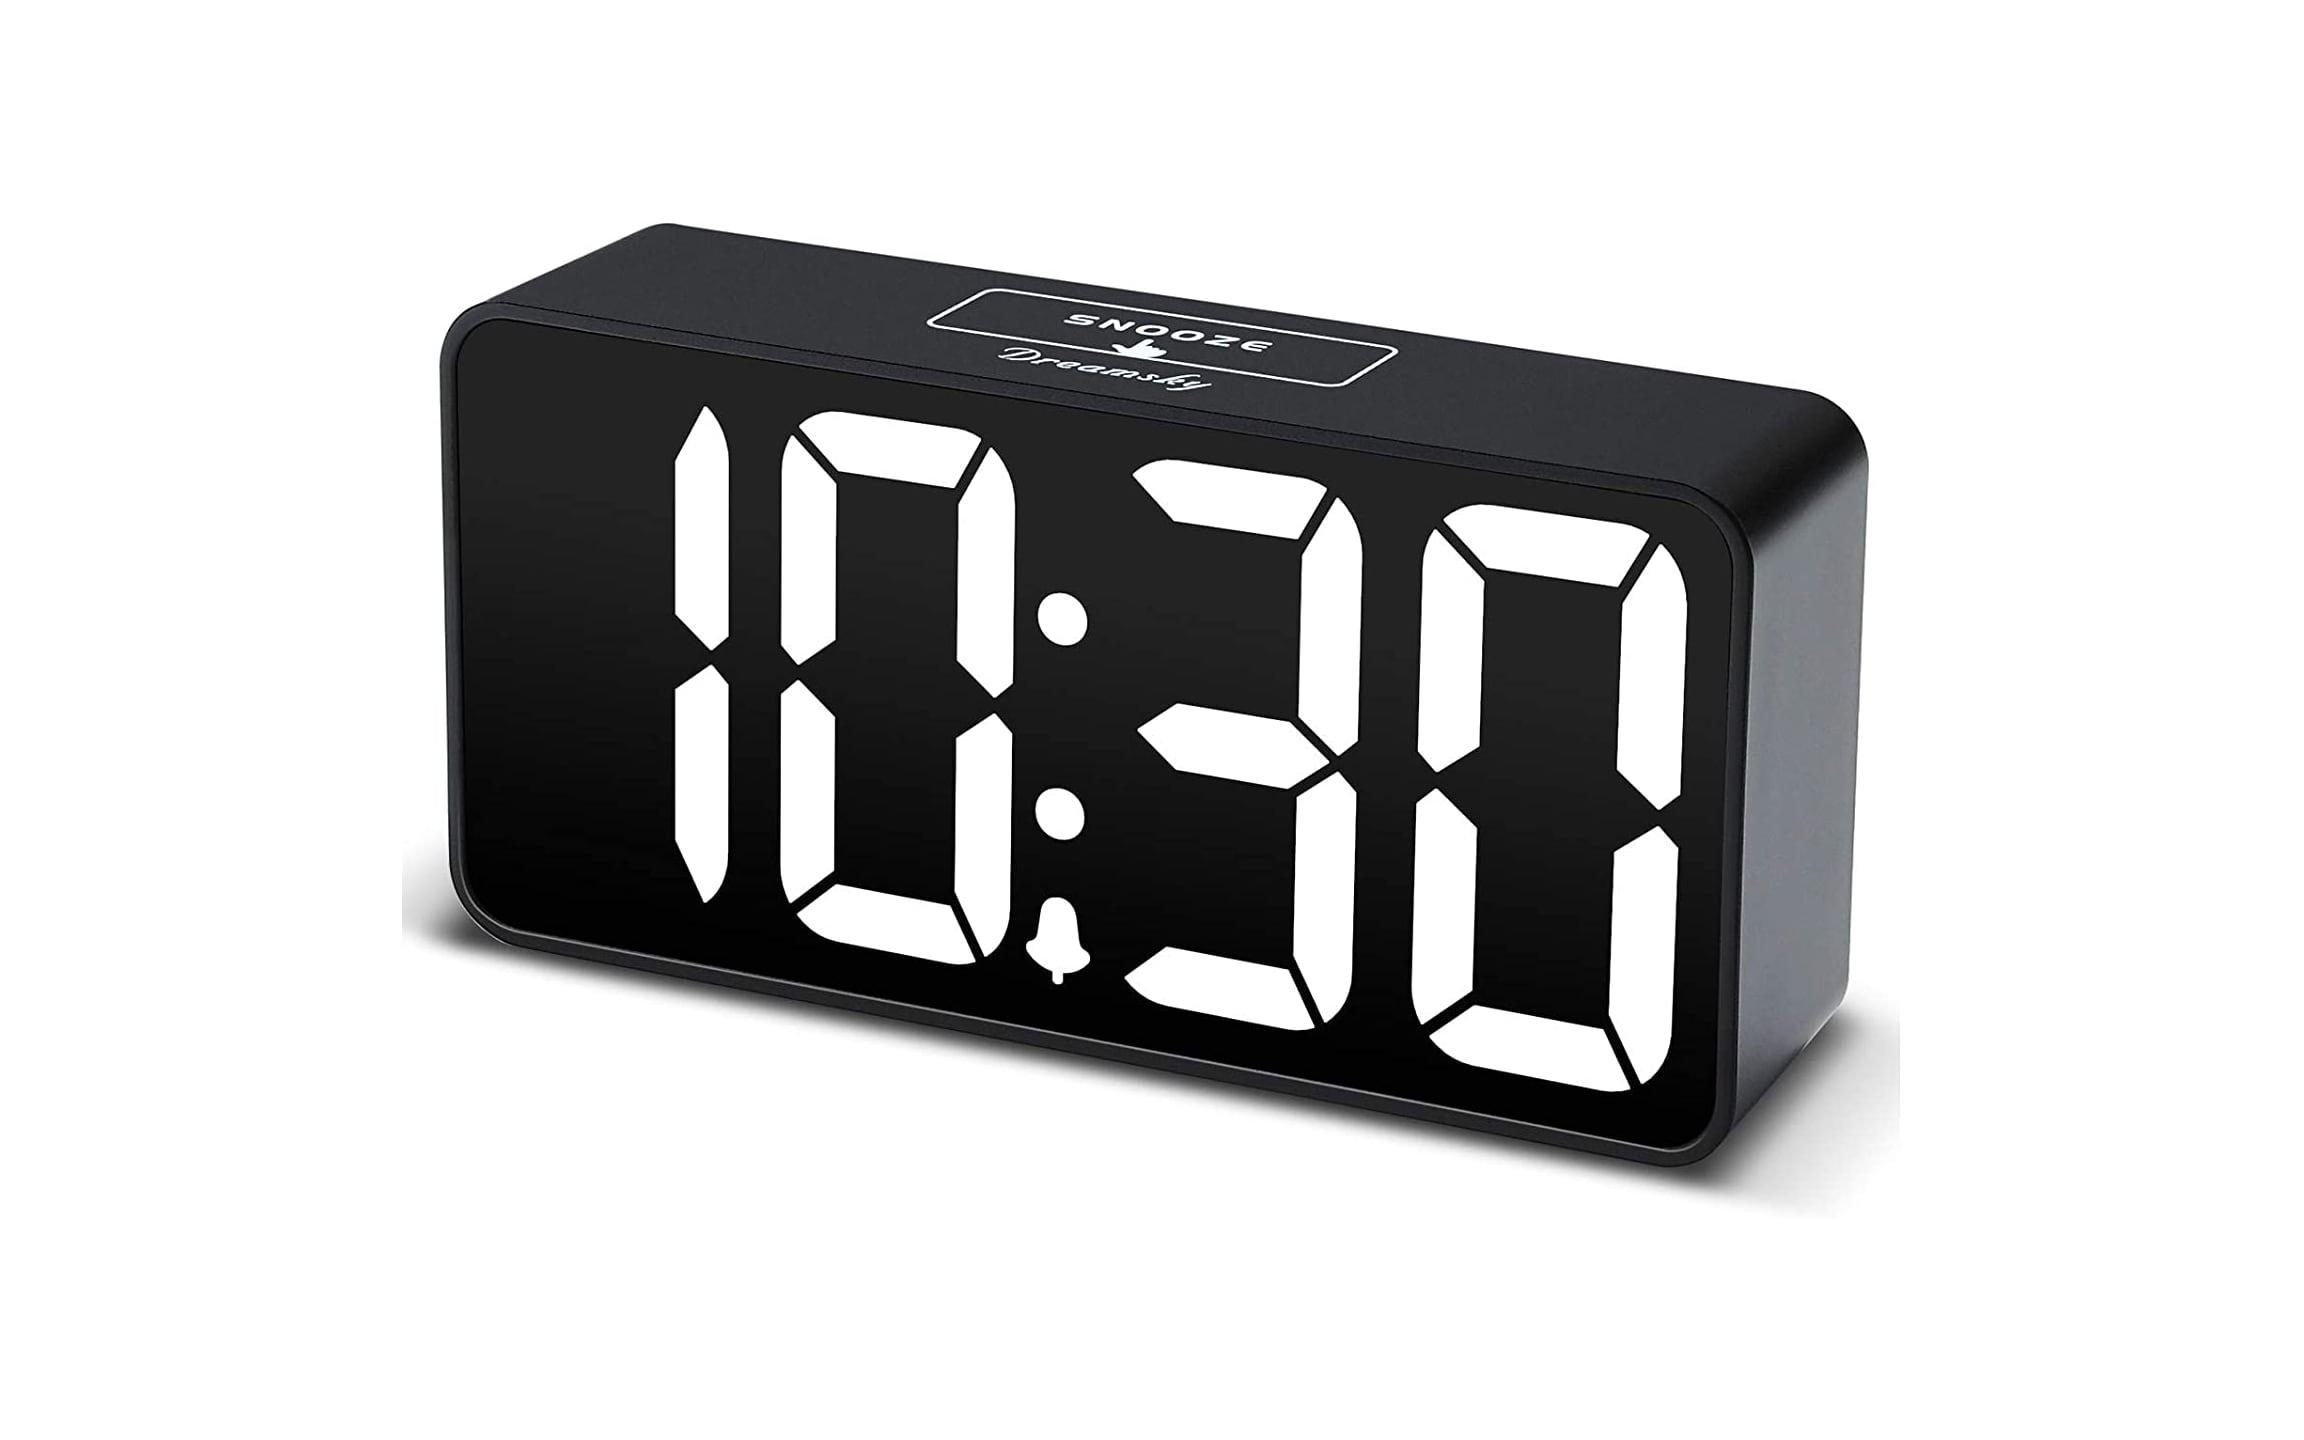 Despertador DreamSky